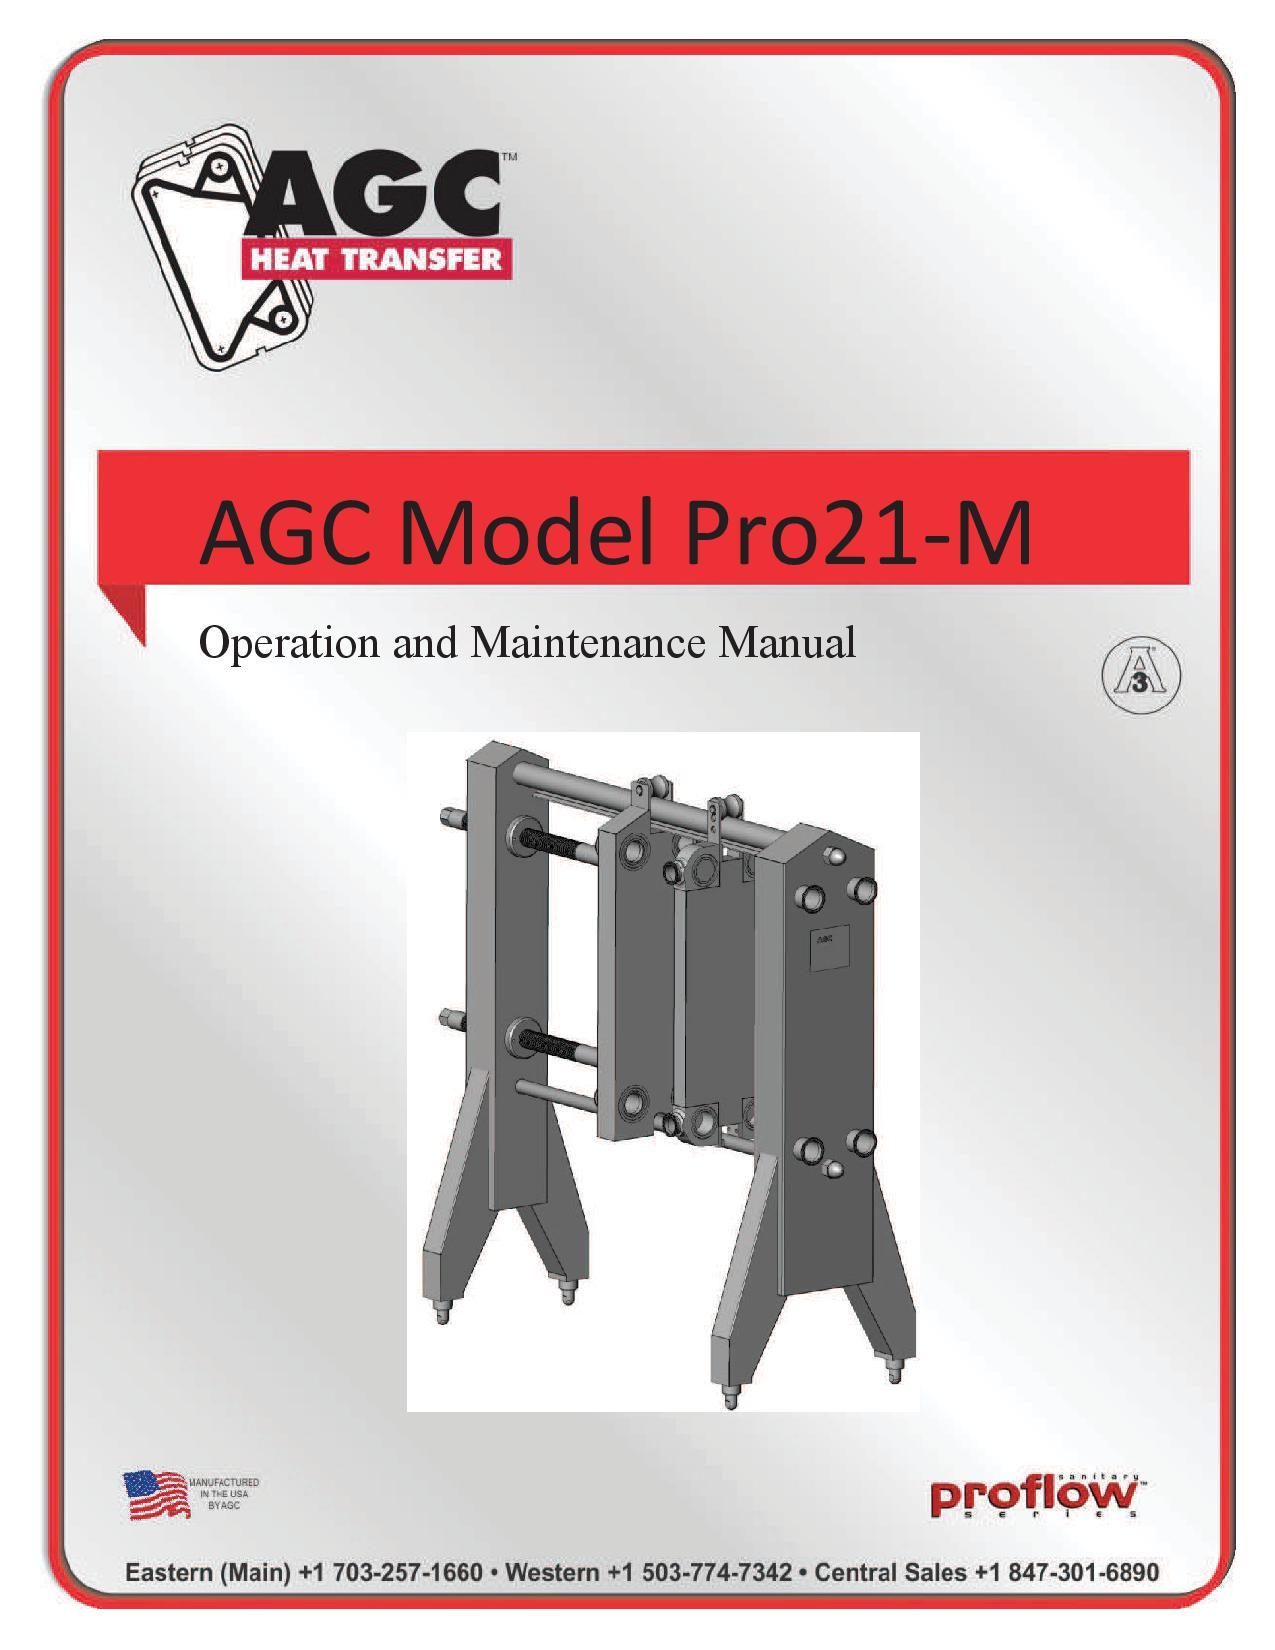 AGC Operating Manual Pro21-M